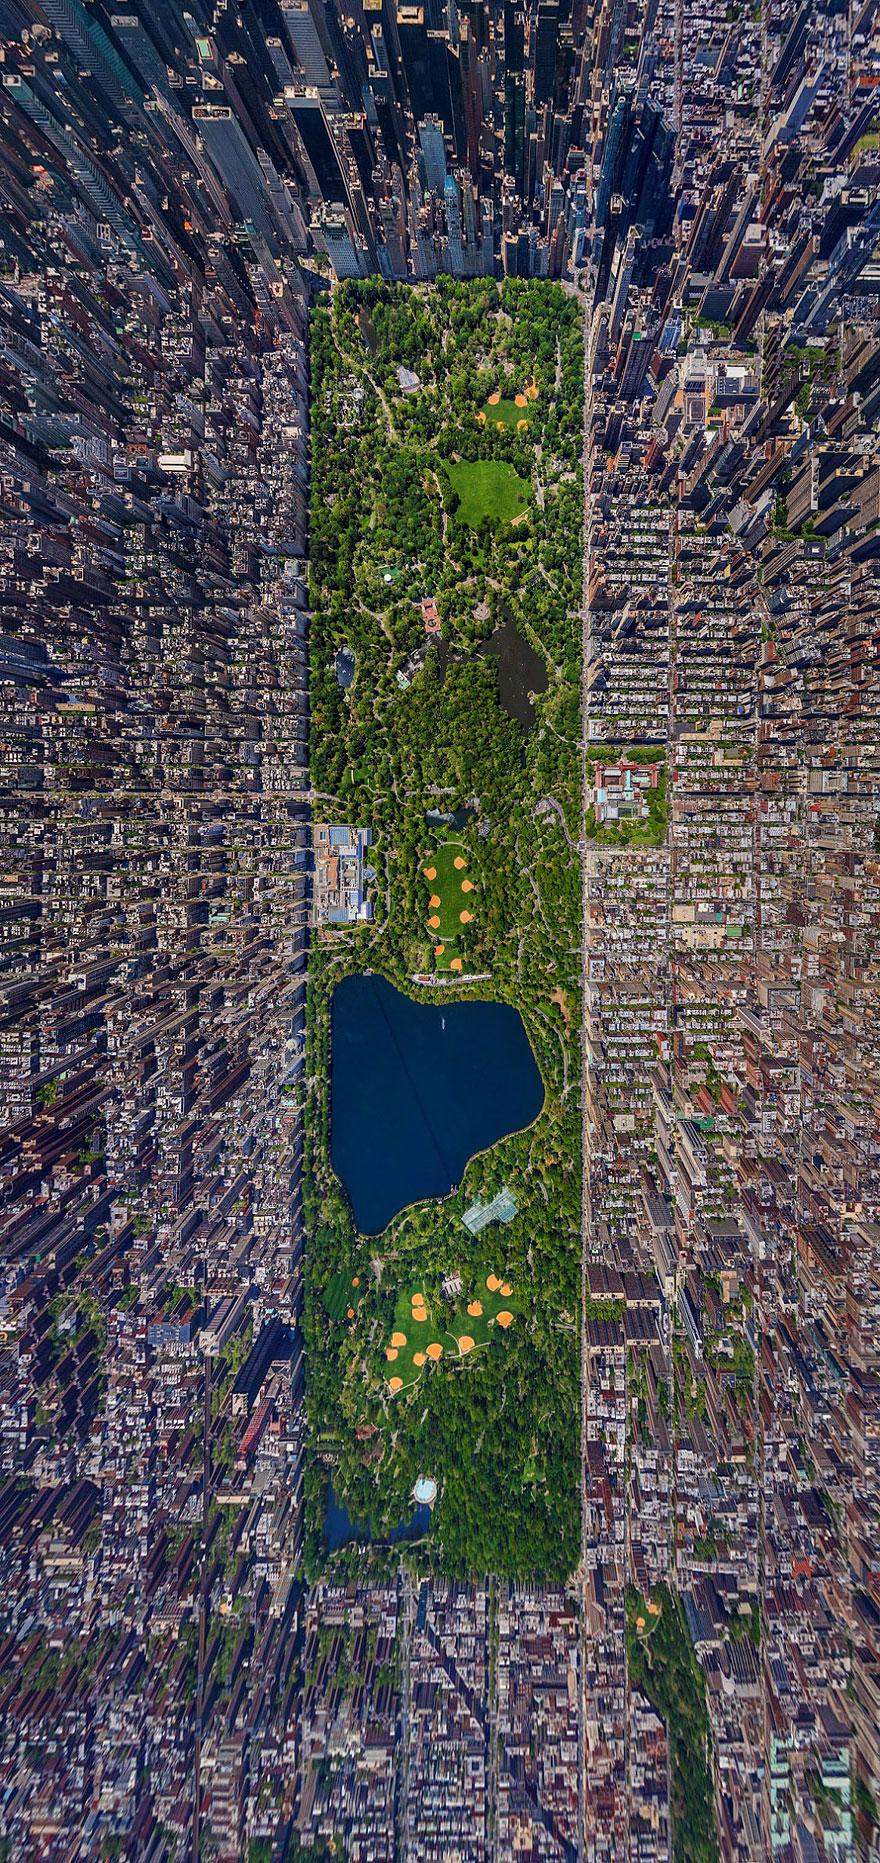 Central Park - bird's-eye view